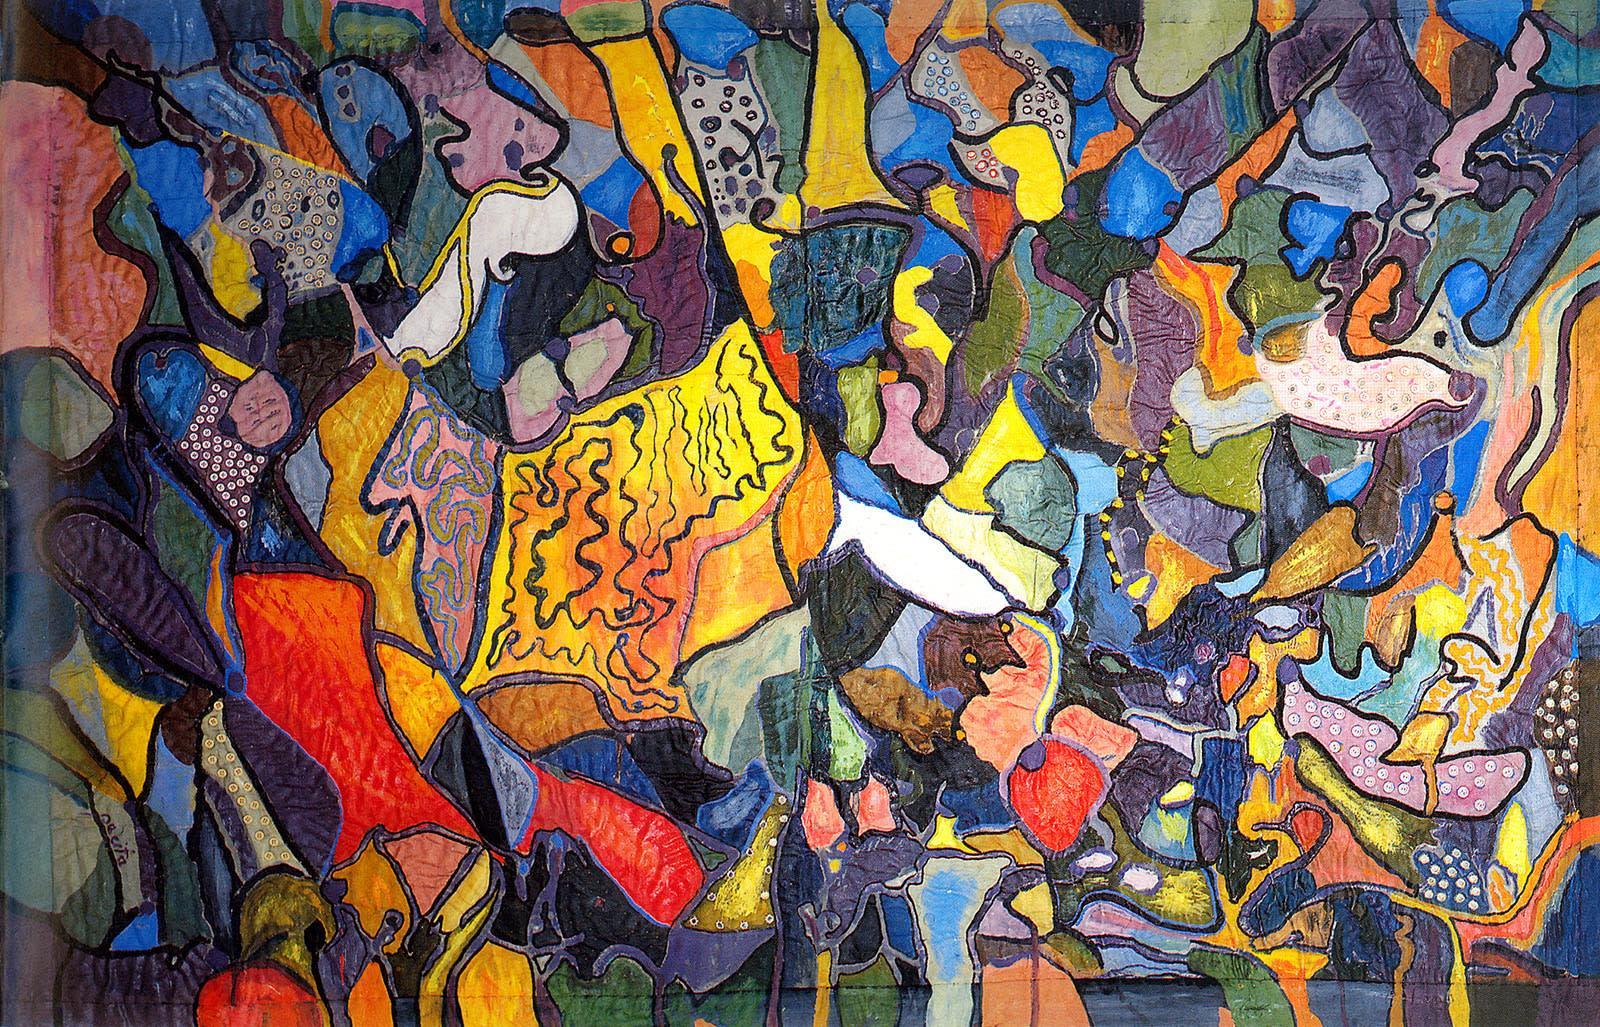 L'artiste philippine Pacita Abad, Gwangju Biennale 2021